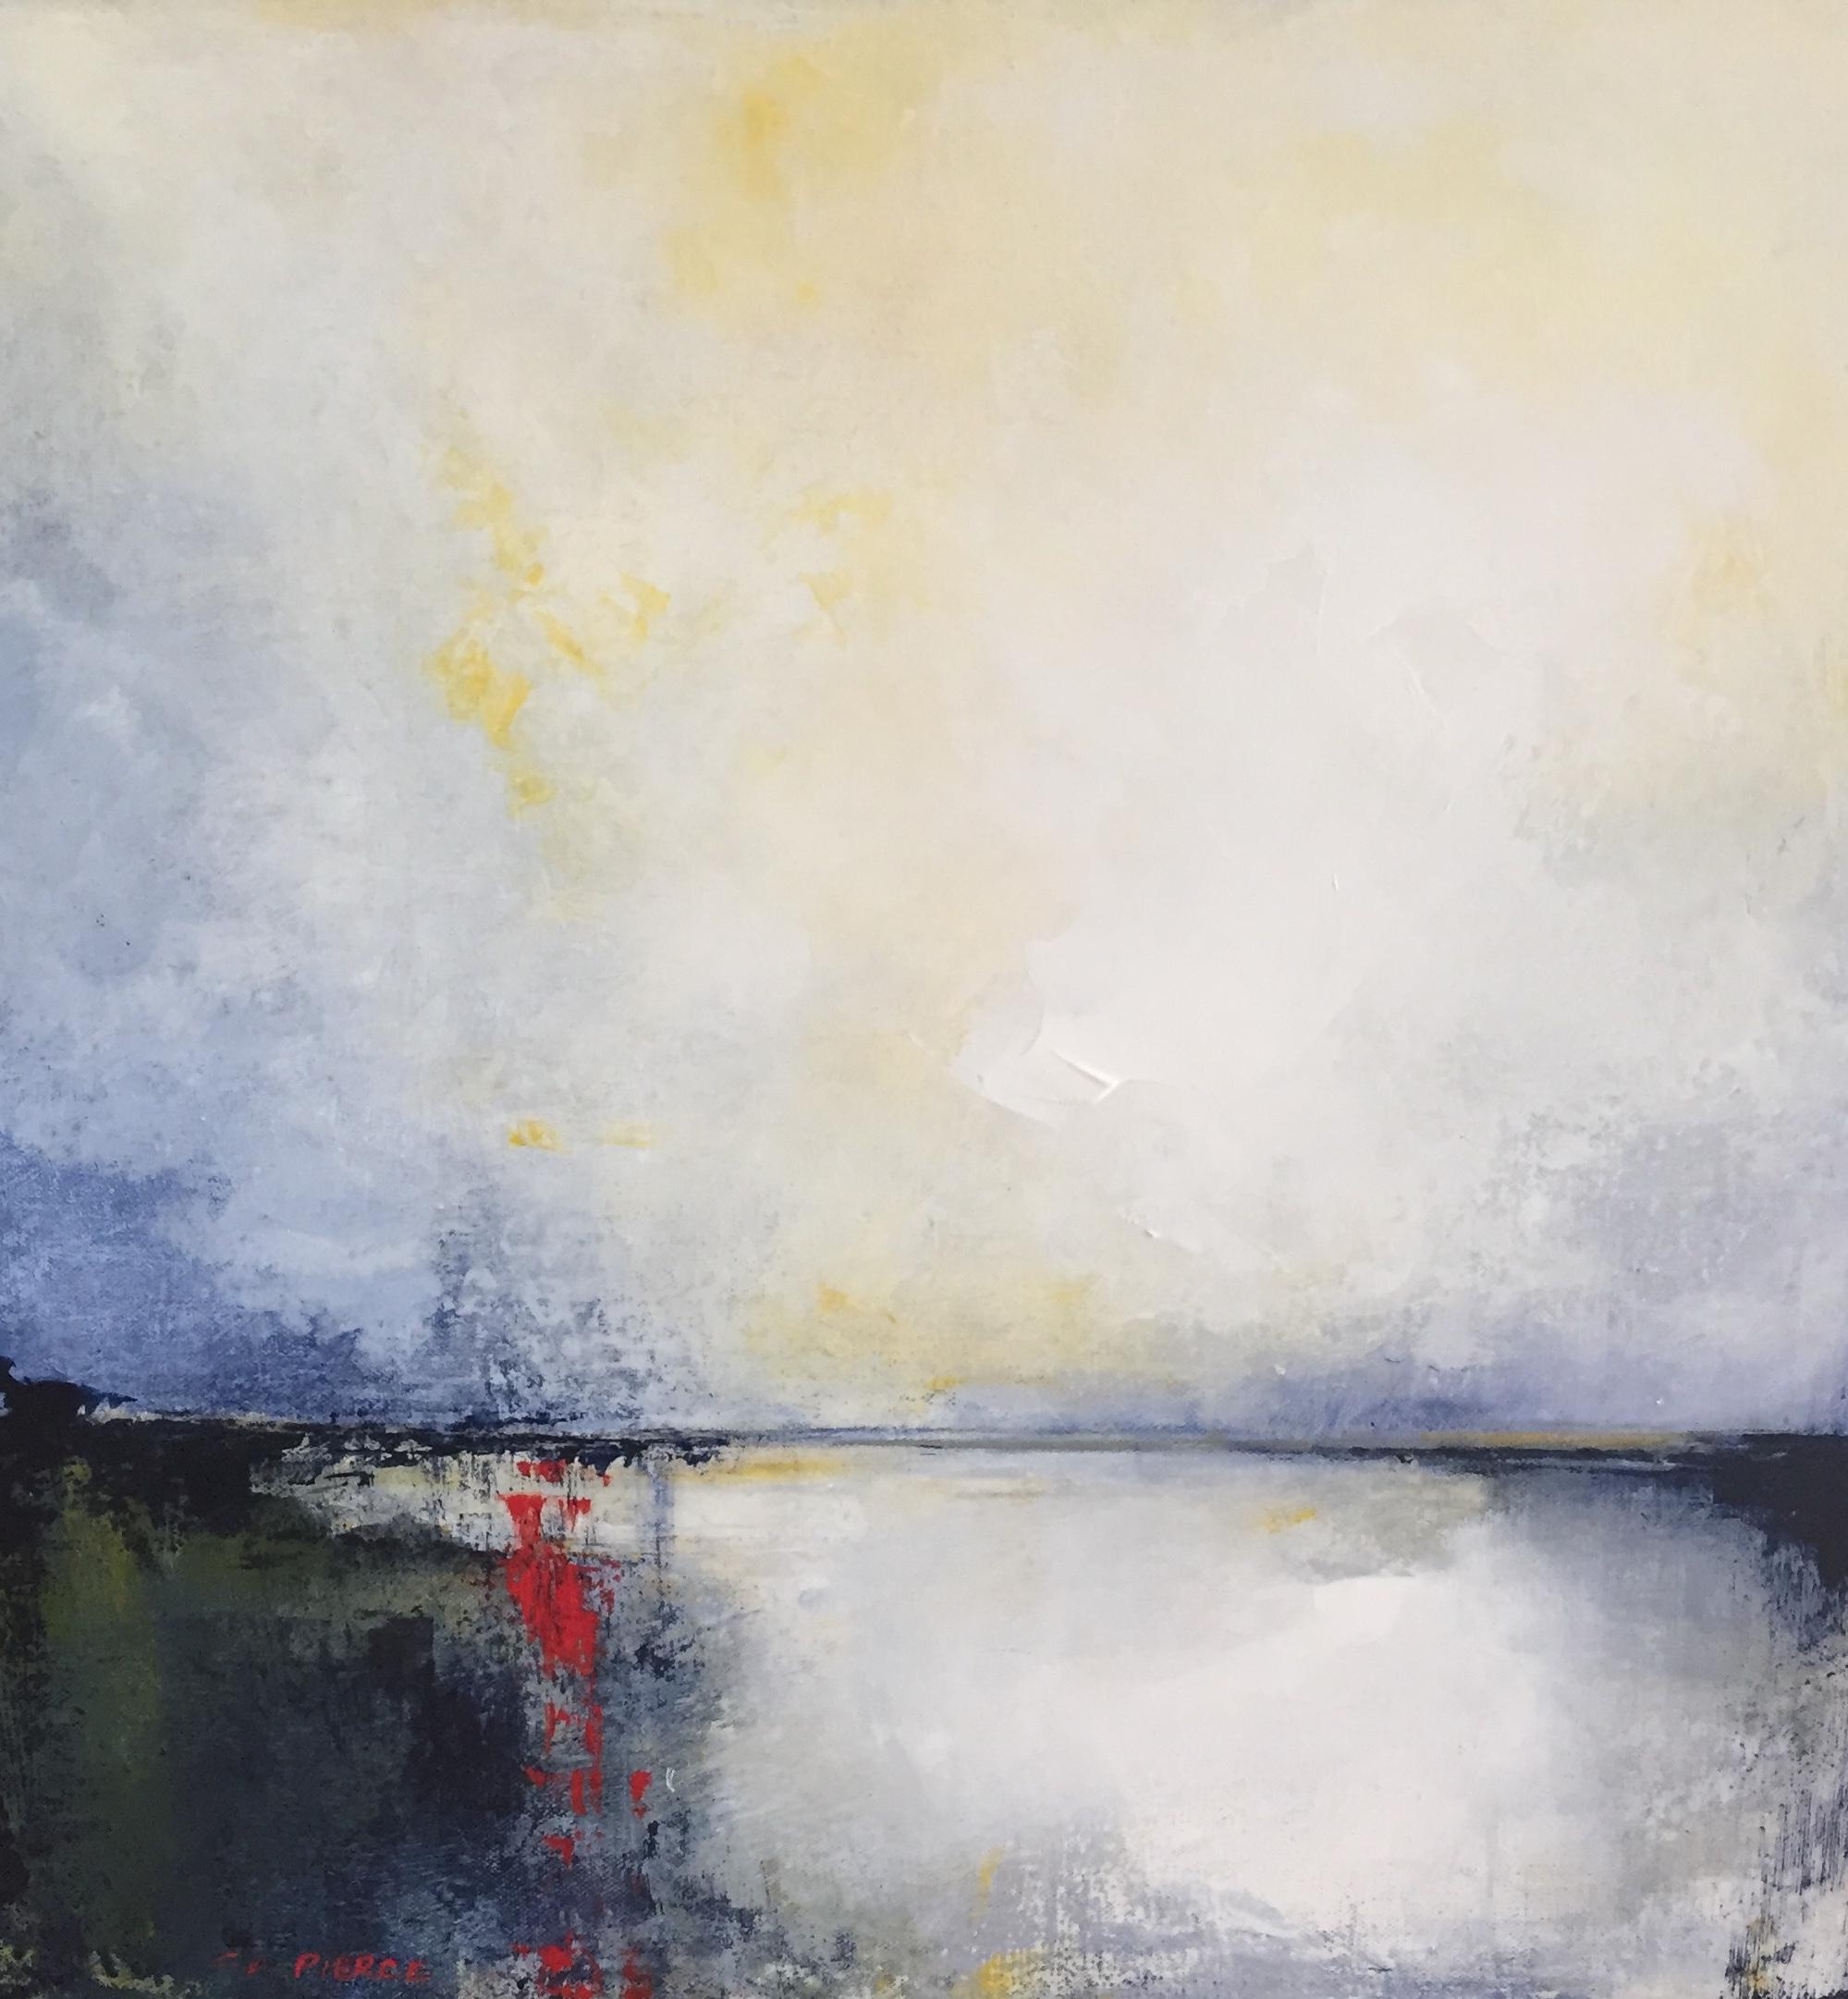 Safe Harbor#Acrylic on Canvas#20 x 20 Inches#$1,600